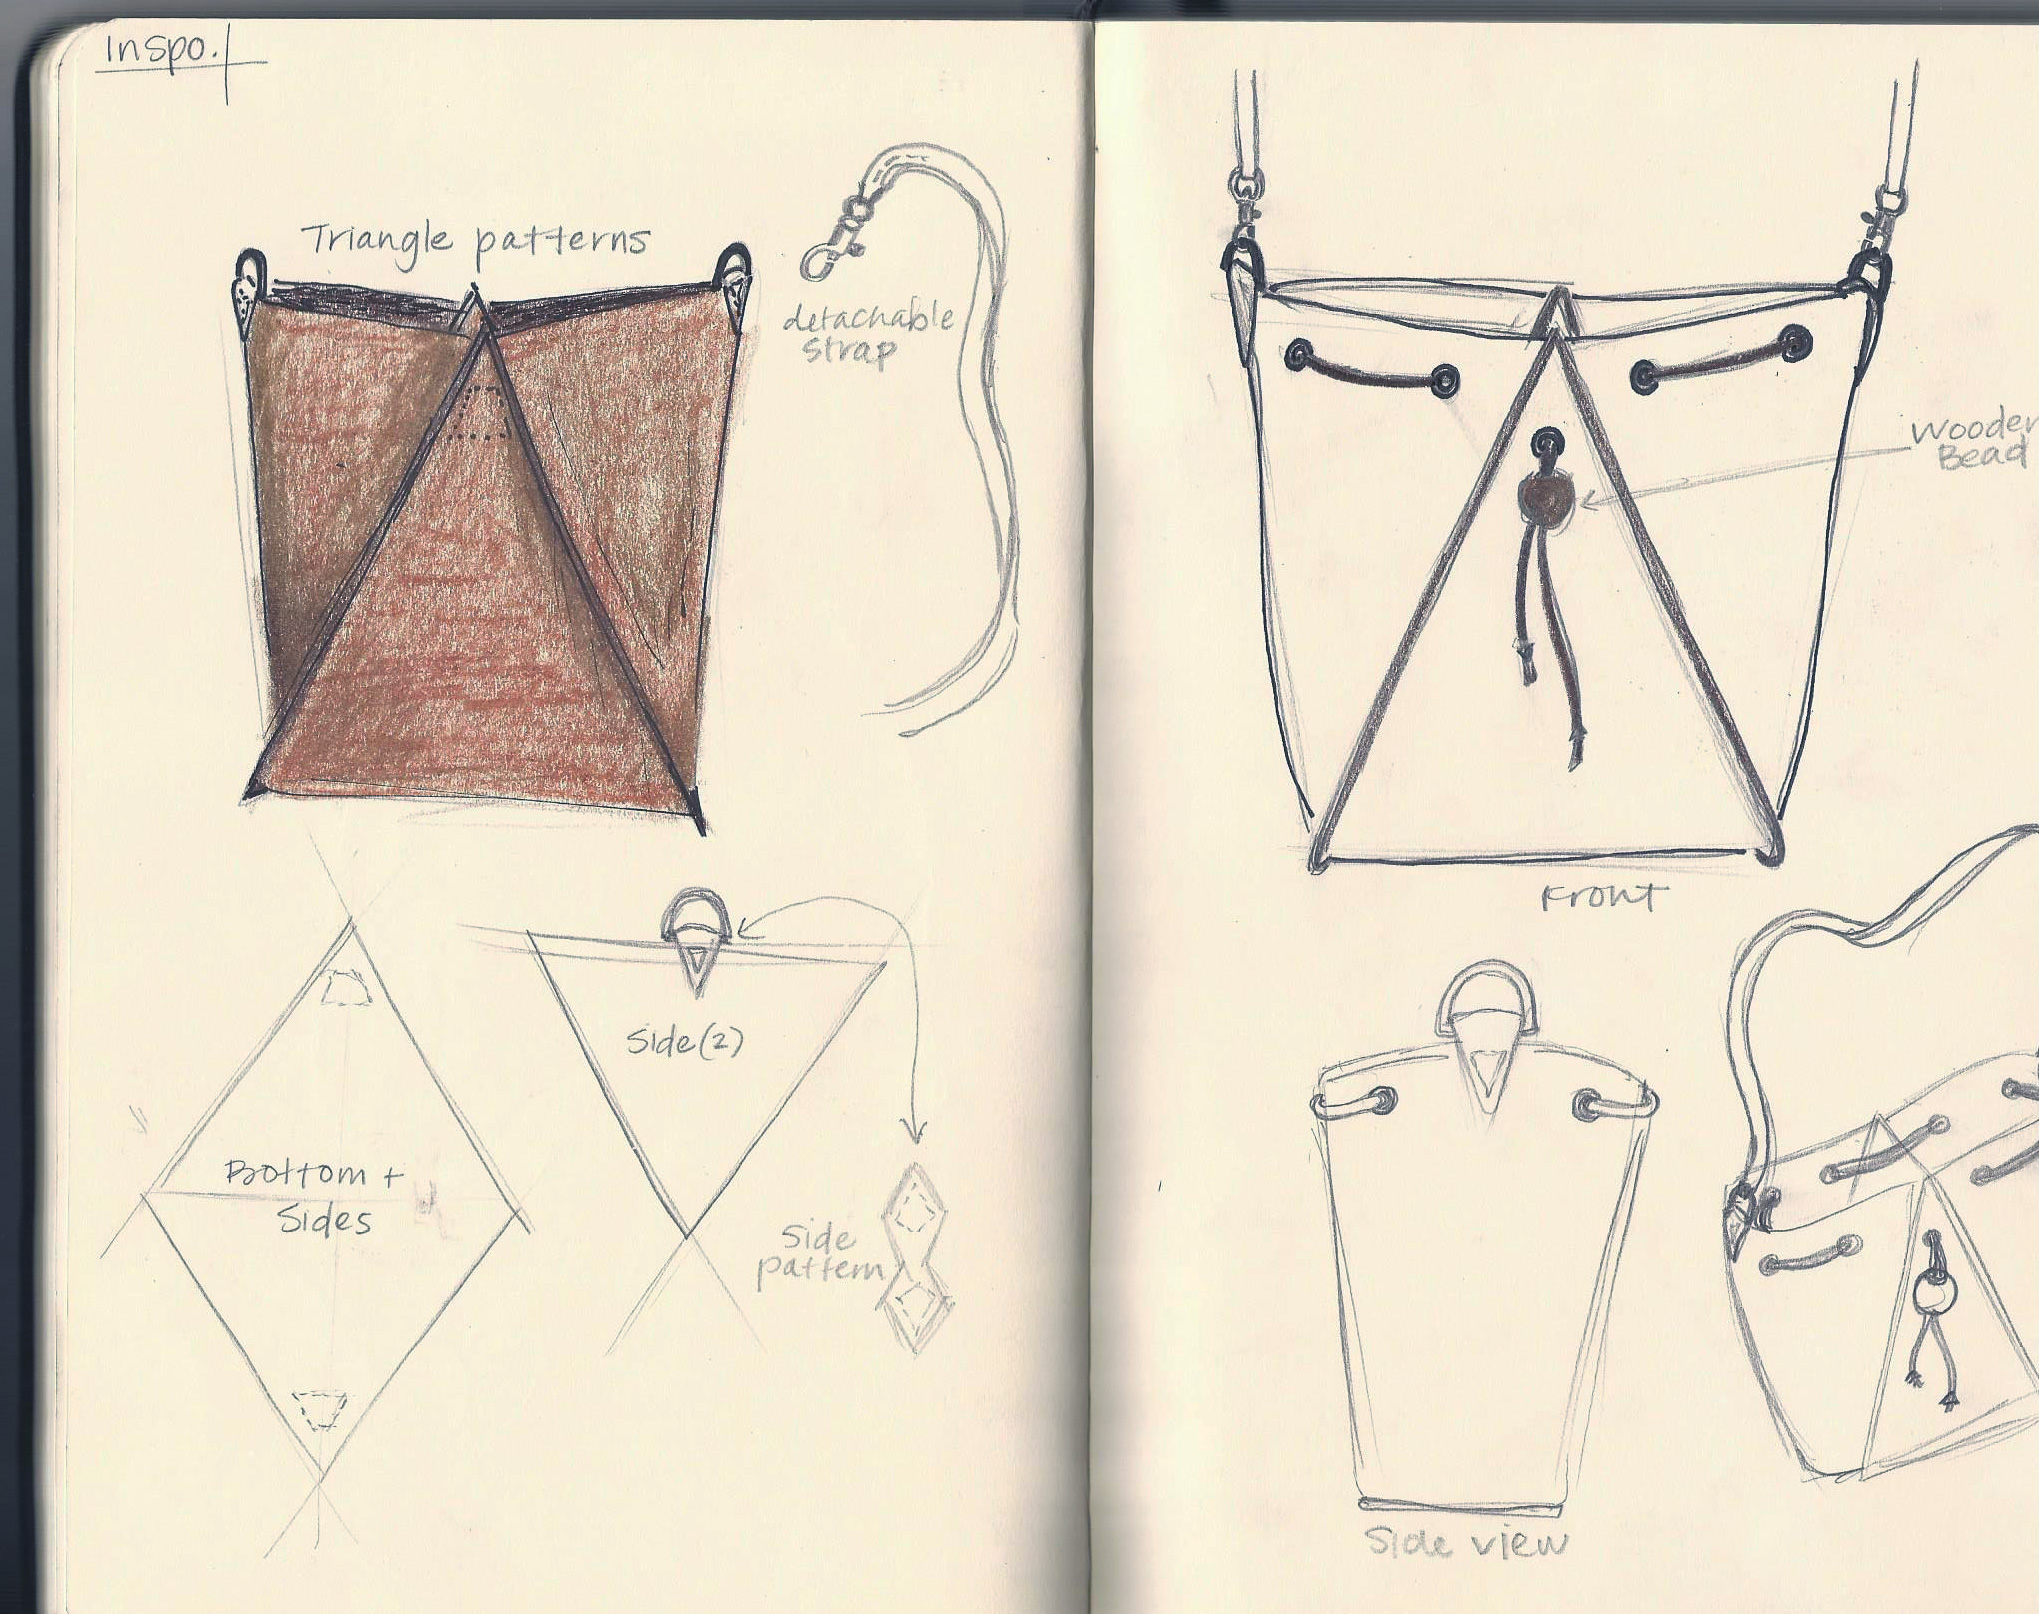 Jenna-Lagonigro-Sketchbook-3.jpg